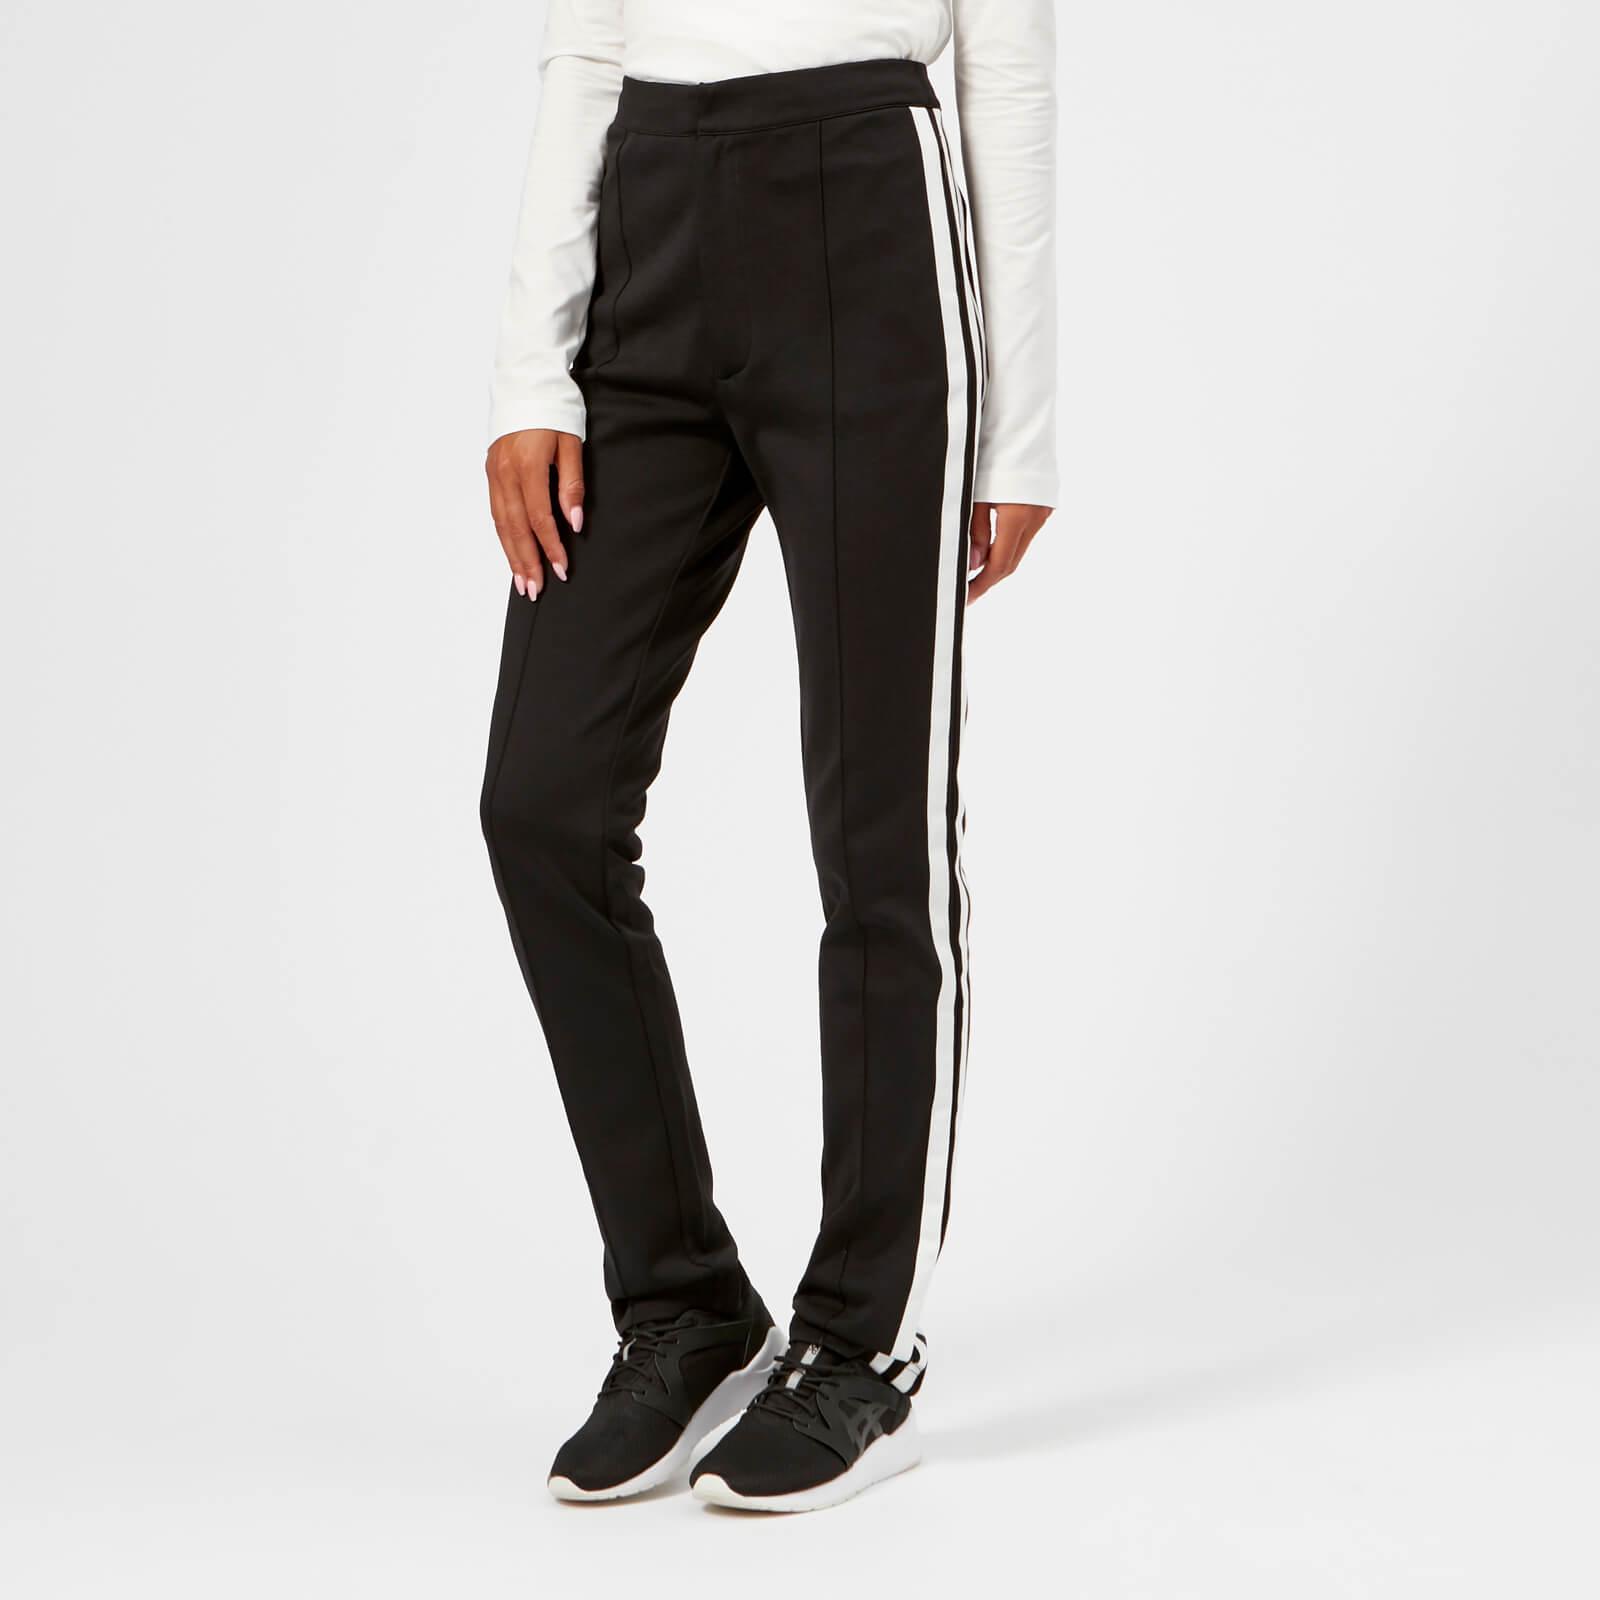 16c88cb1ae Y-3 Women's Matt Track High Waist Pants - Black - Free UK Delivery over £50